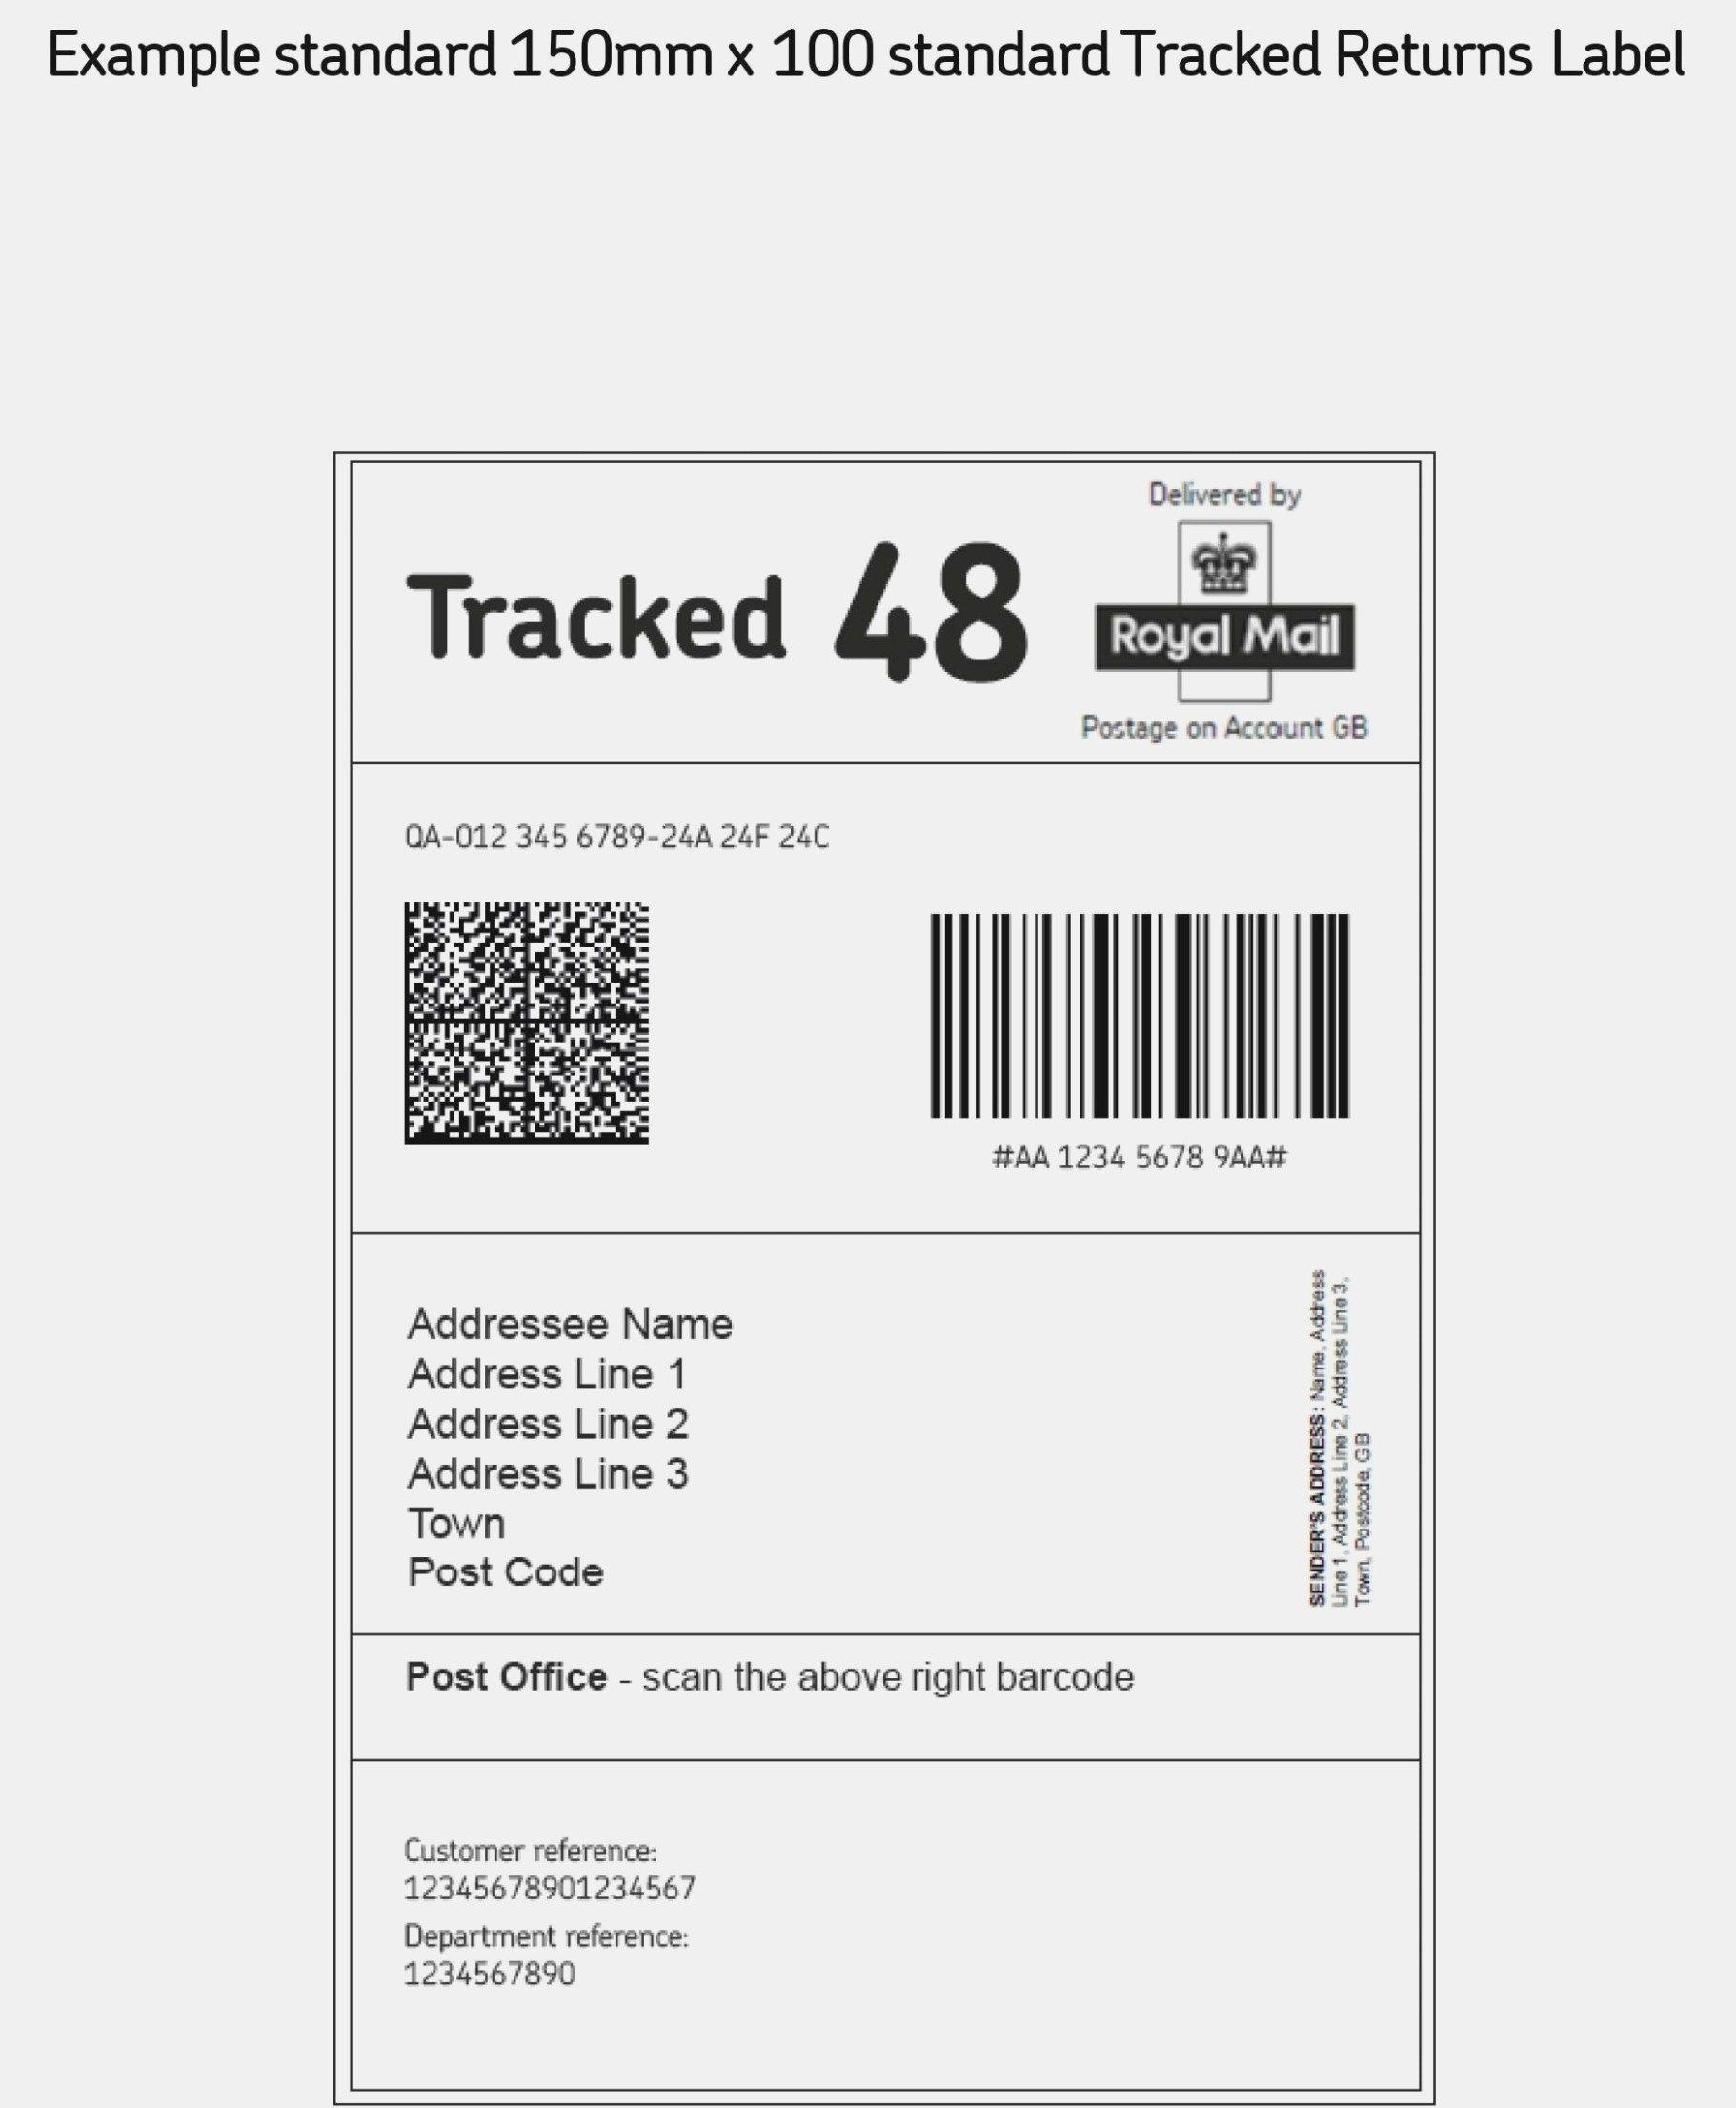 Officemax Label Template Unique Office Depot Label Templates In Officemax Label Template